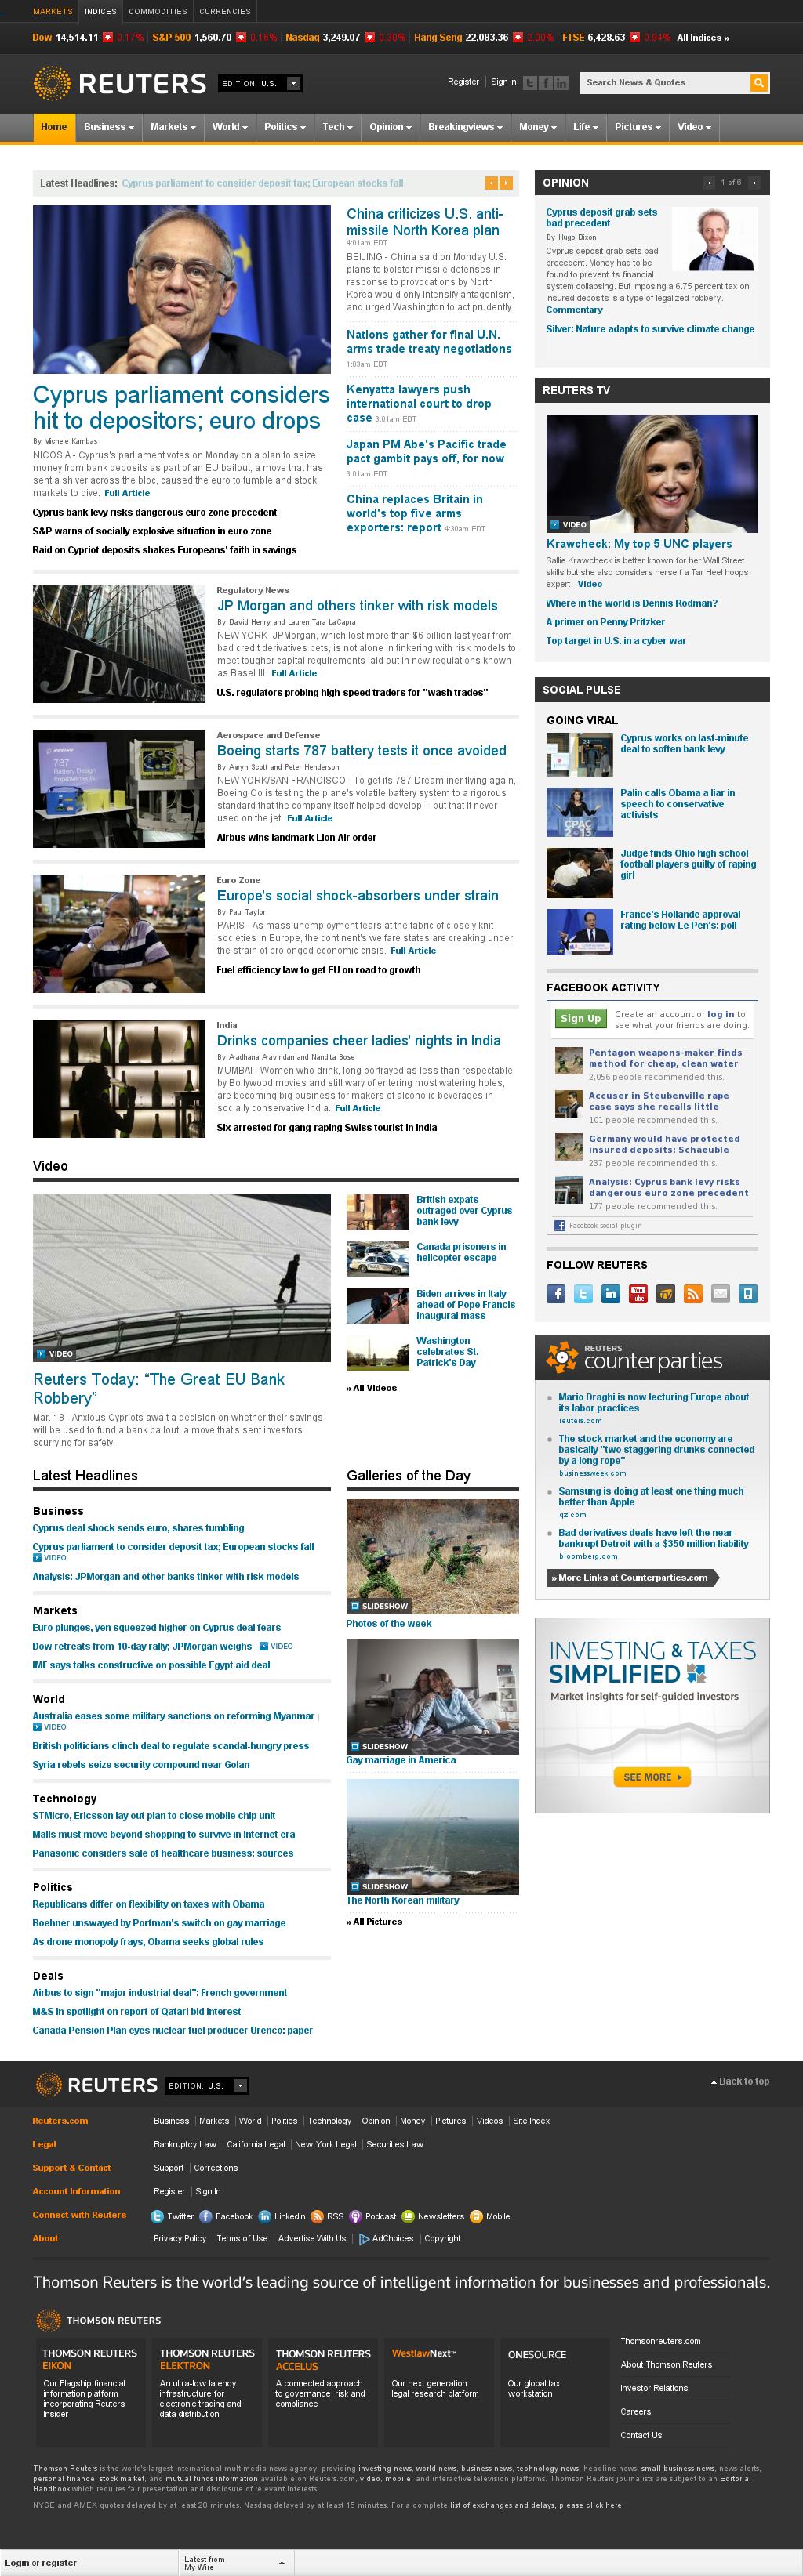 Reuters at Monday March 18, 2013, 9:19 a.m. UTC